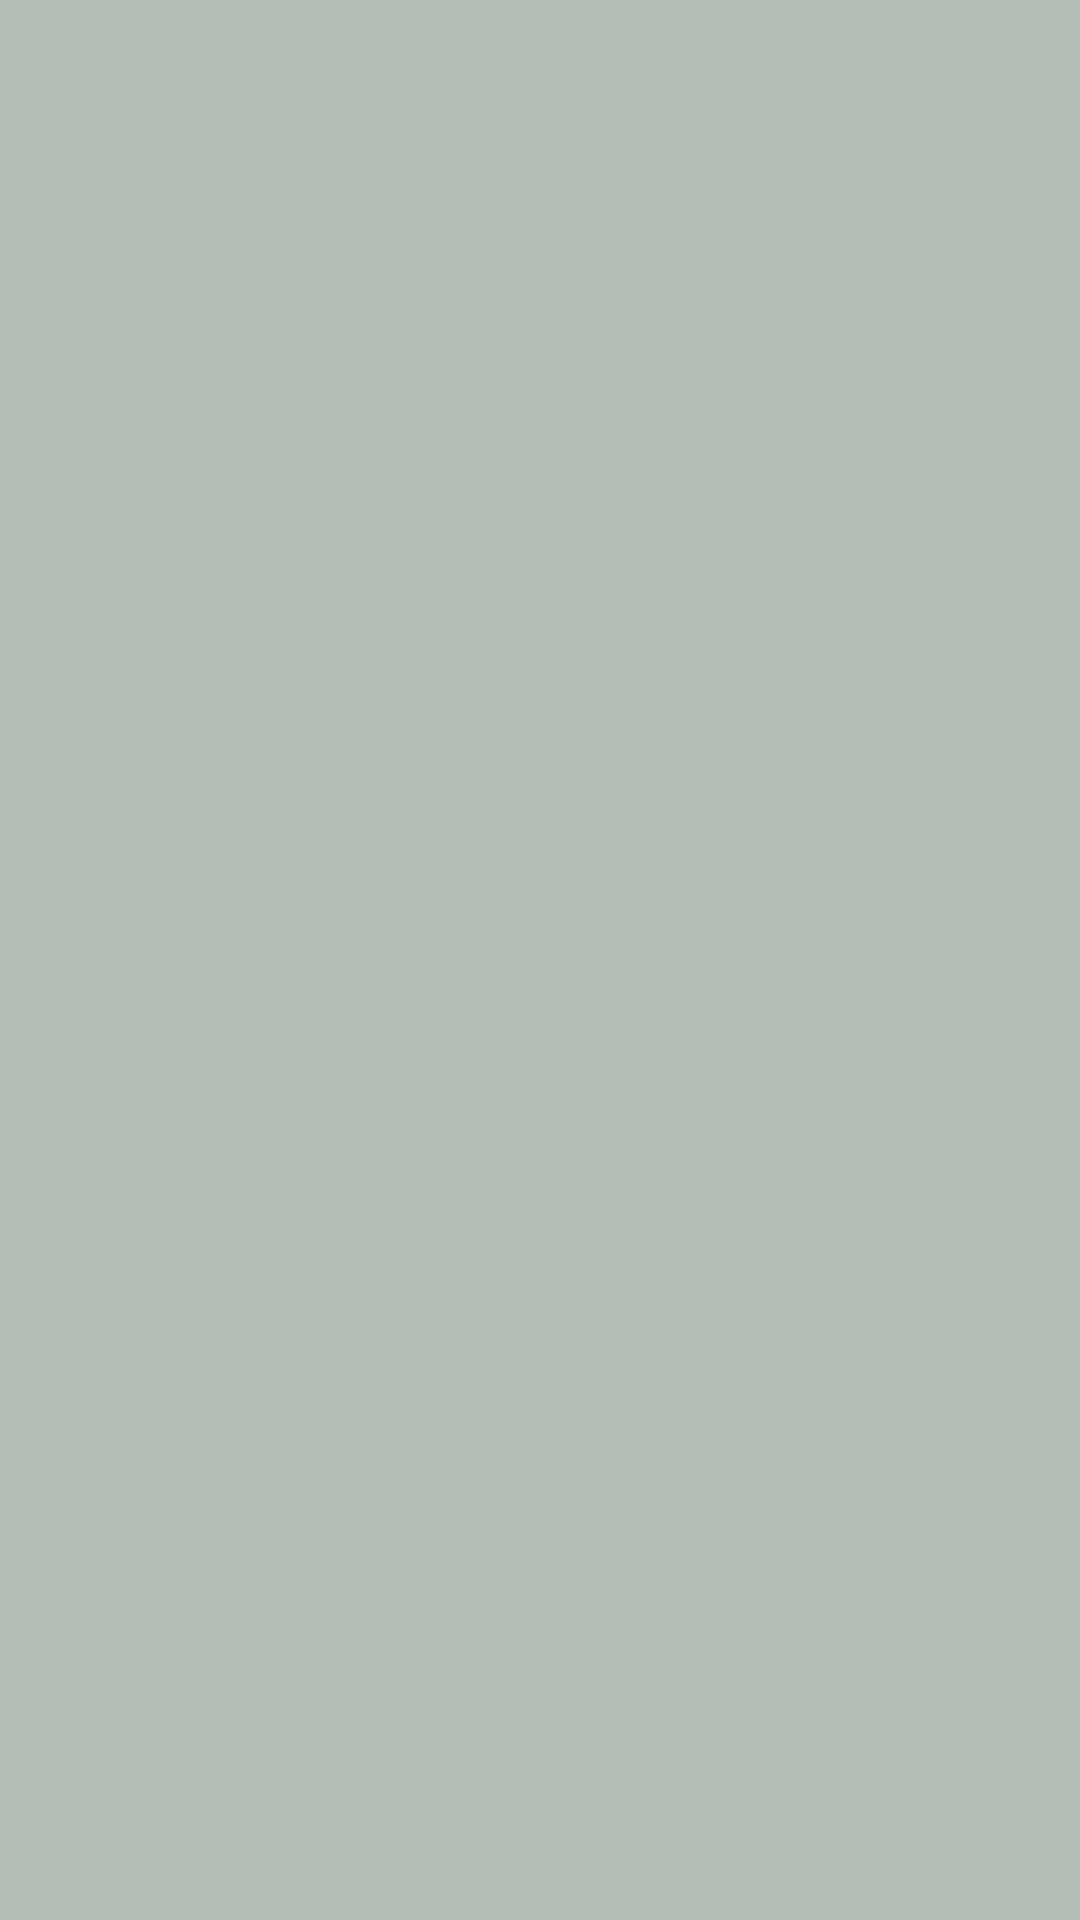 1080x1920 Ash Grey Solid Color Background